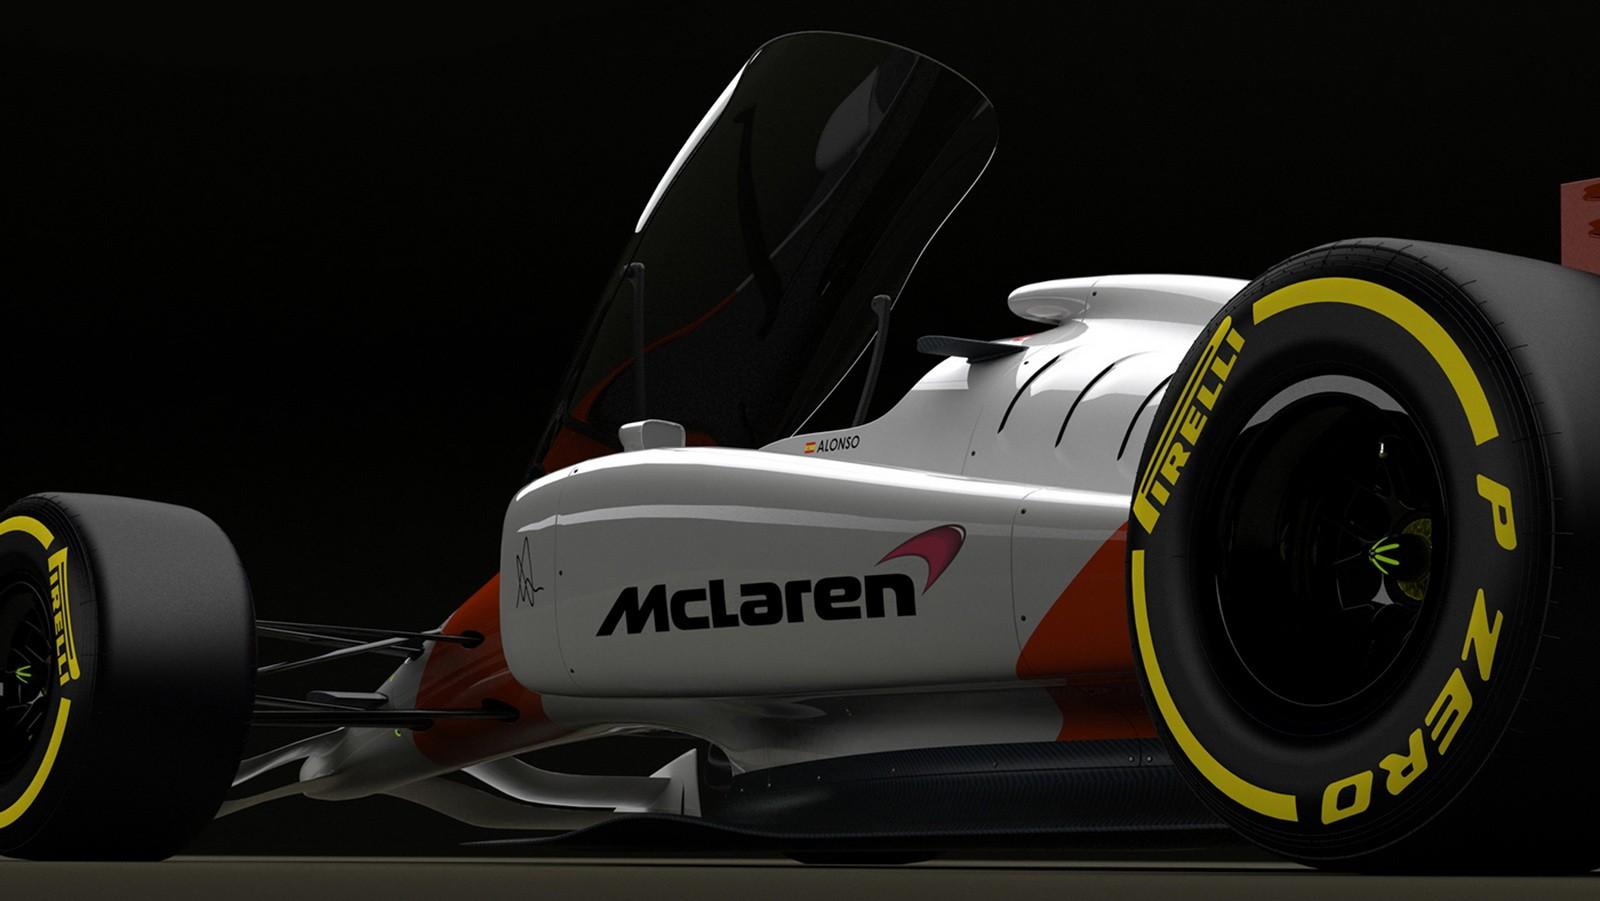 future-formula-1-concept-earns-closed-cockpit-honda-mclaren-livery-photo-gallery_6